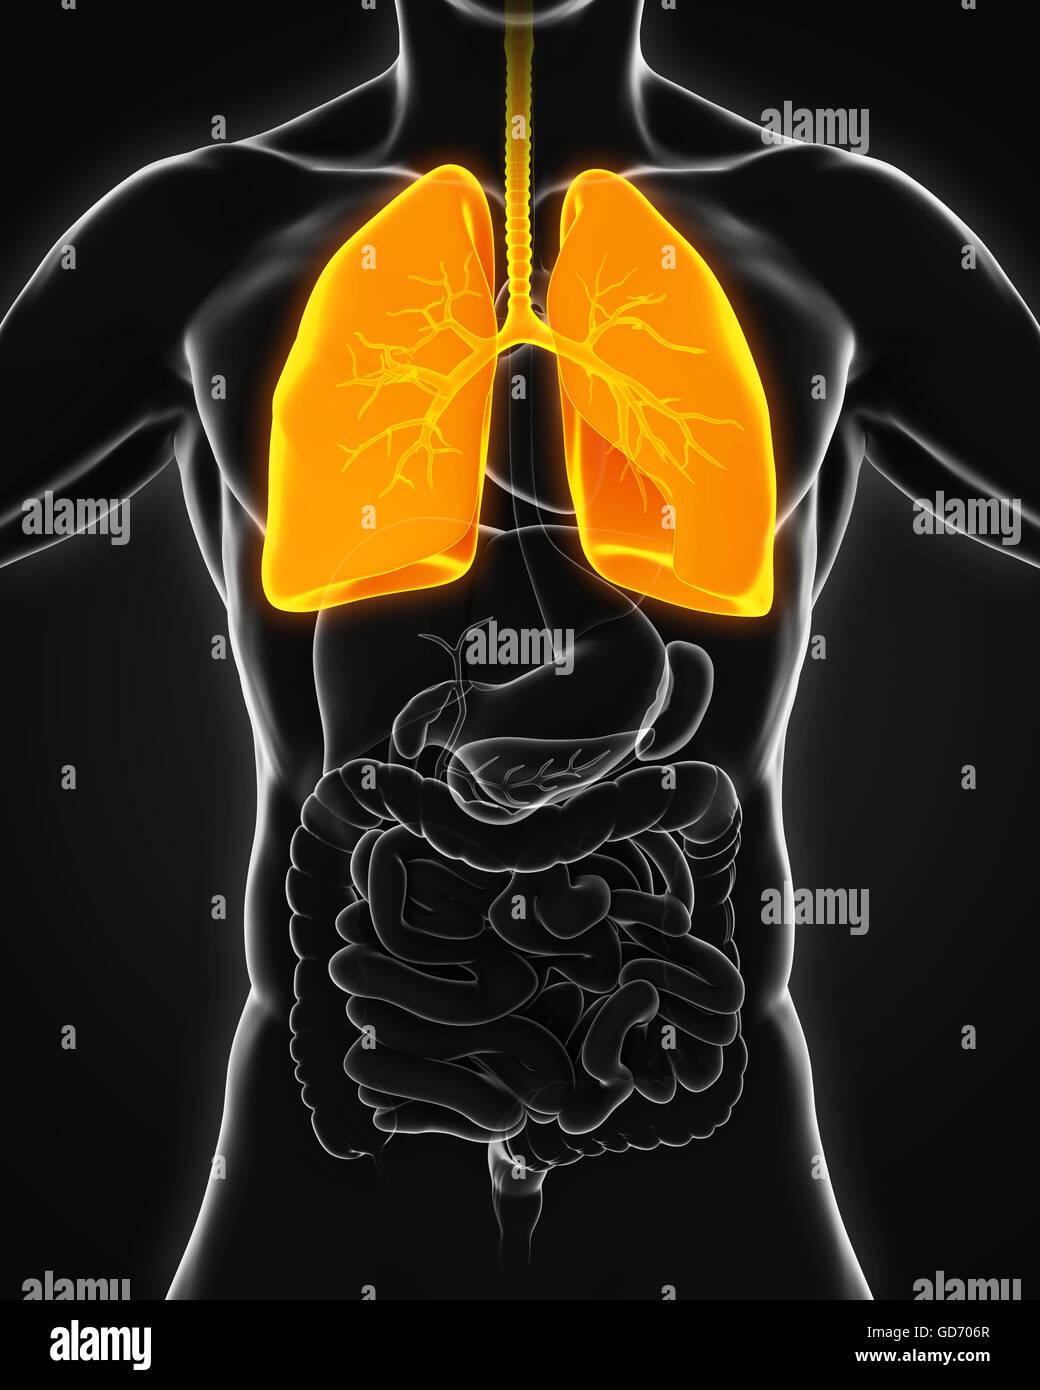 Human Respiratory System - Stock Image